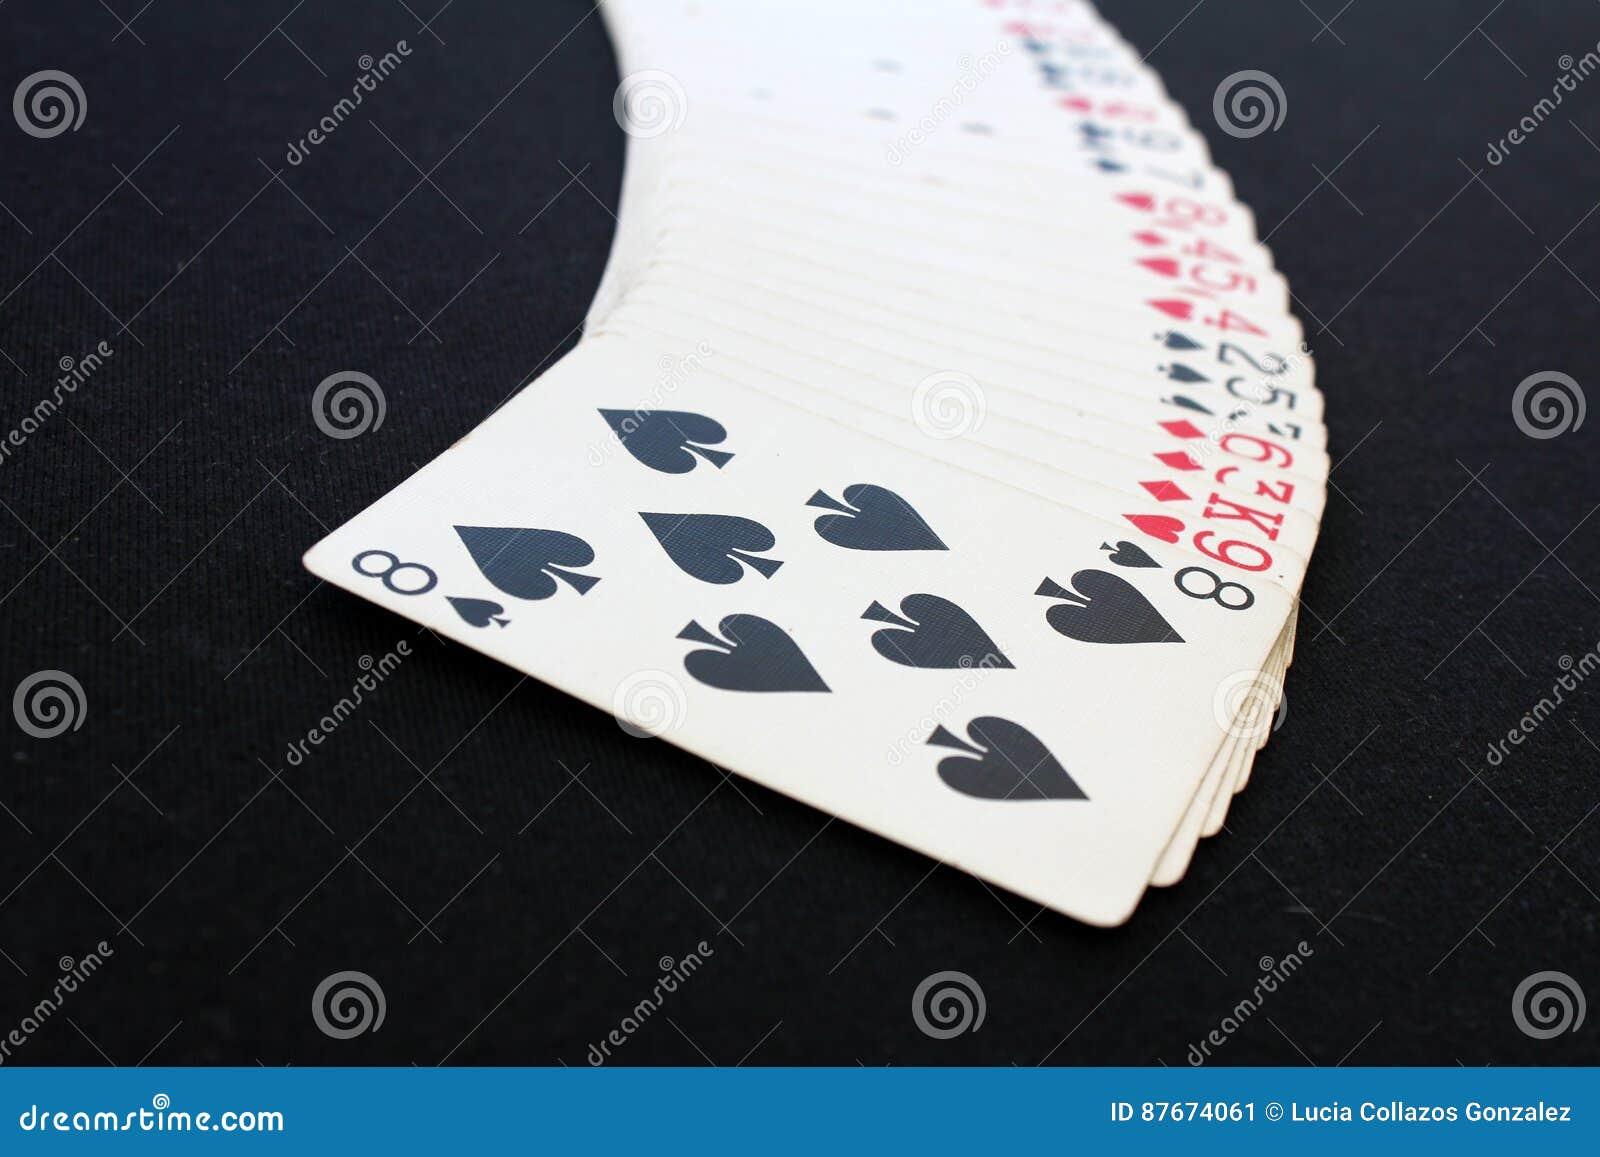 Poker table background - Background Black Casino Poker Table